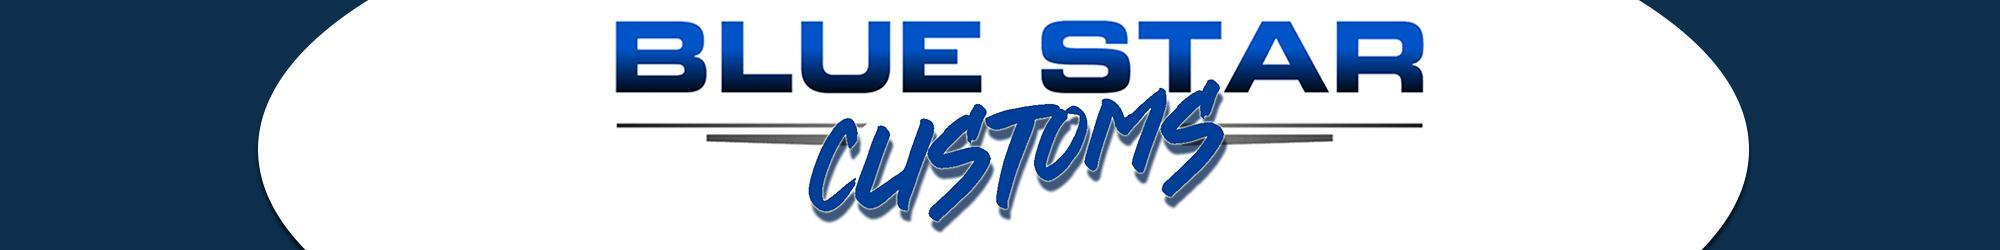 Blue Star Customs